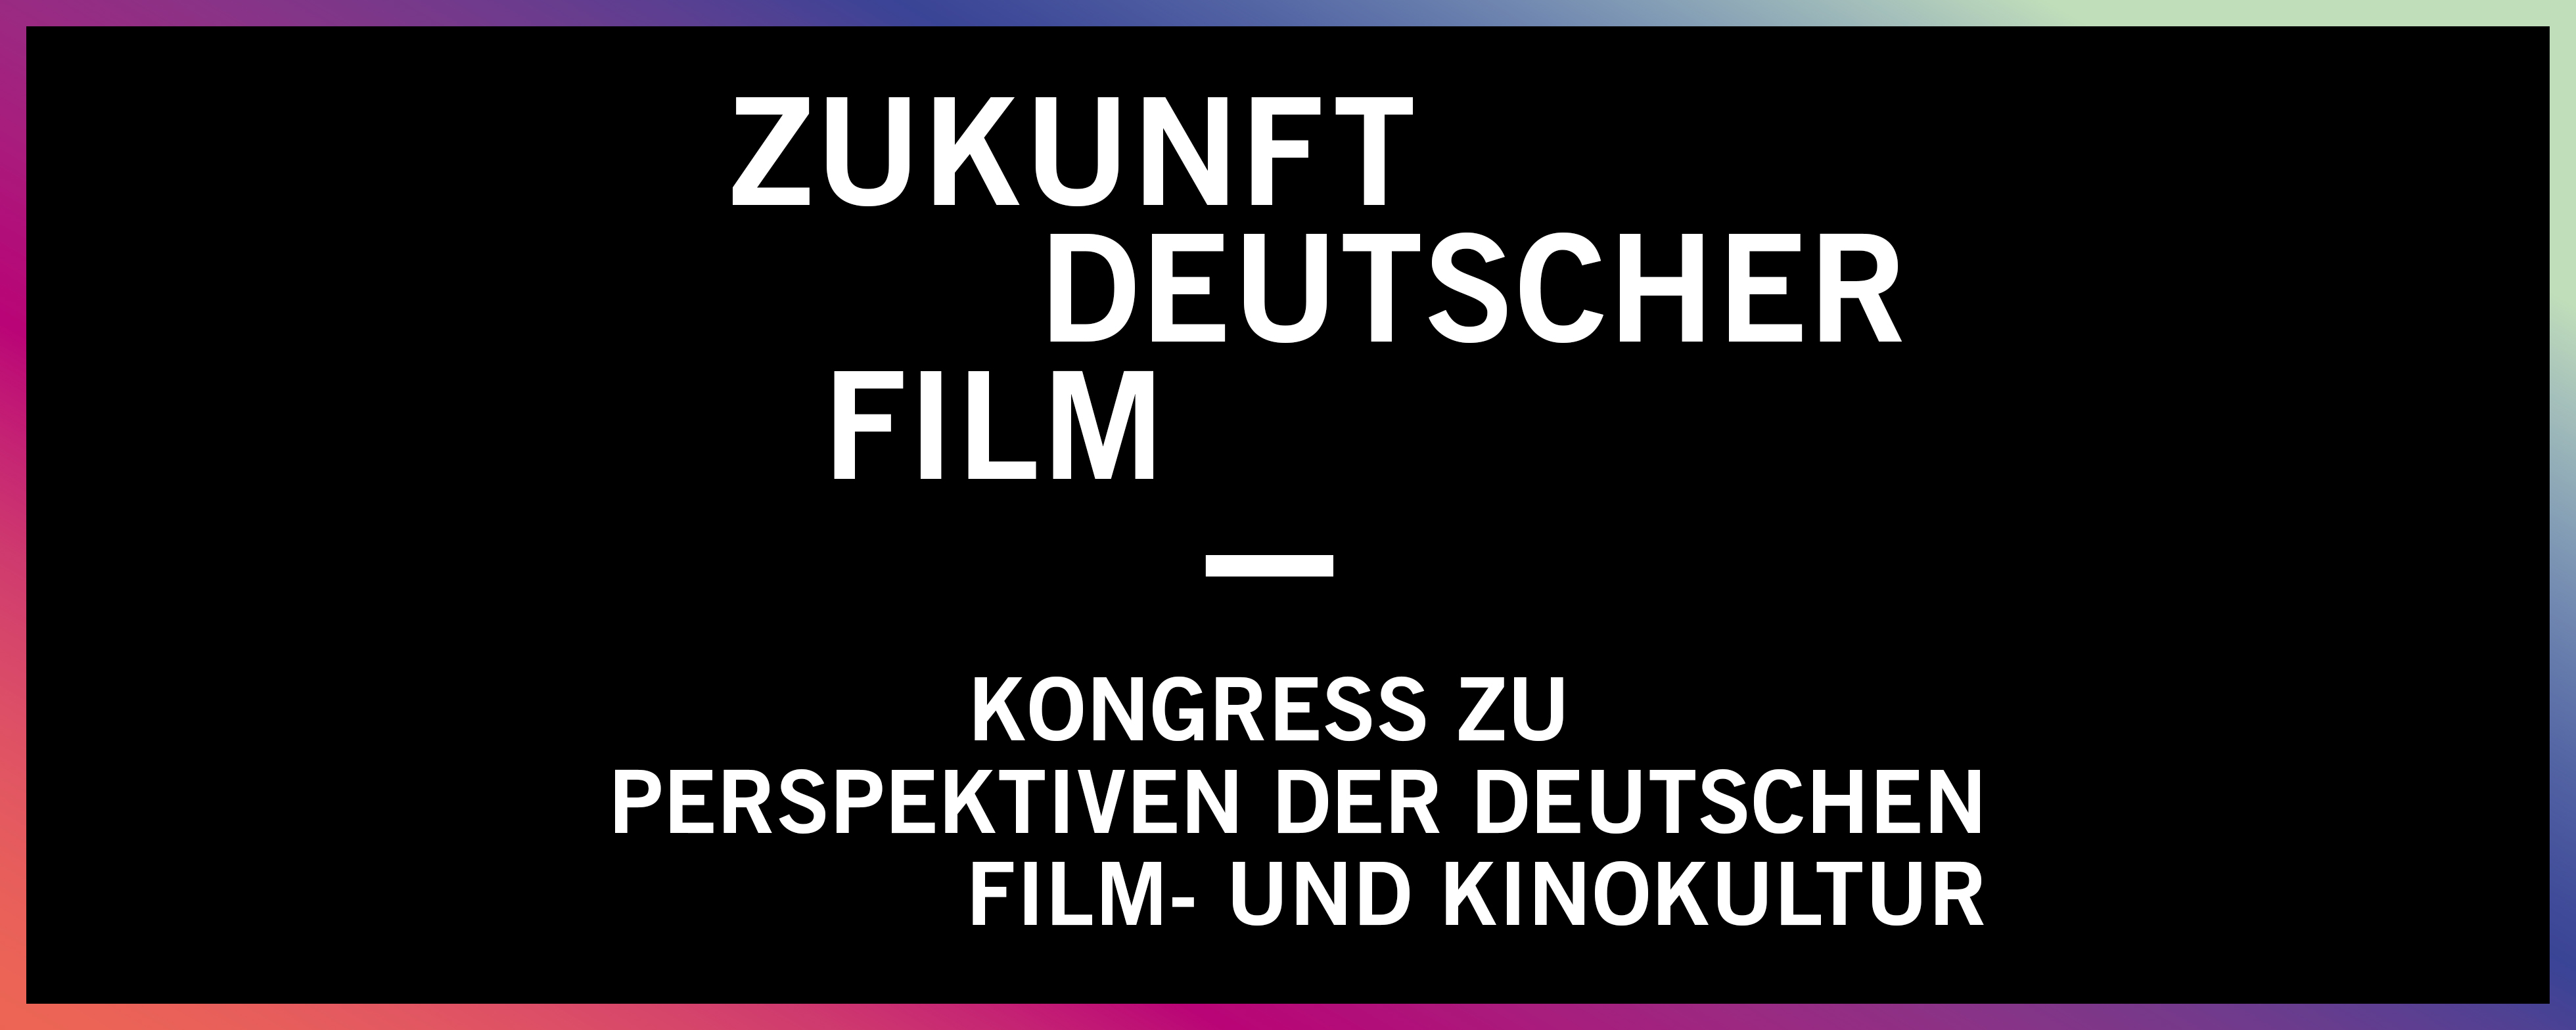 der kongress film